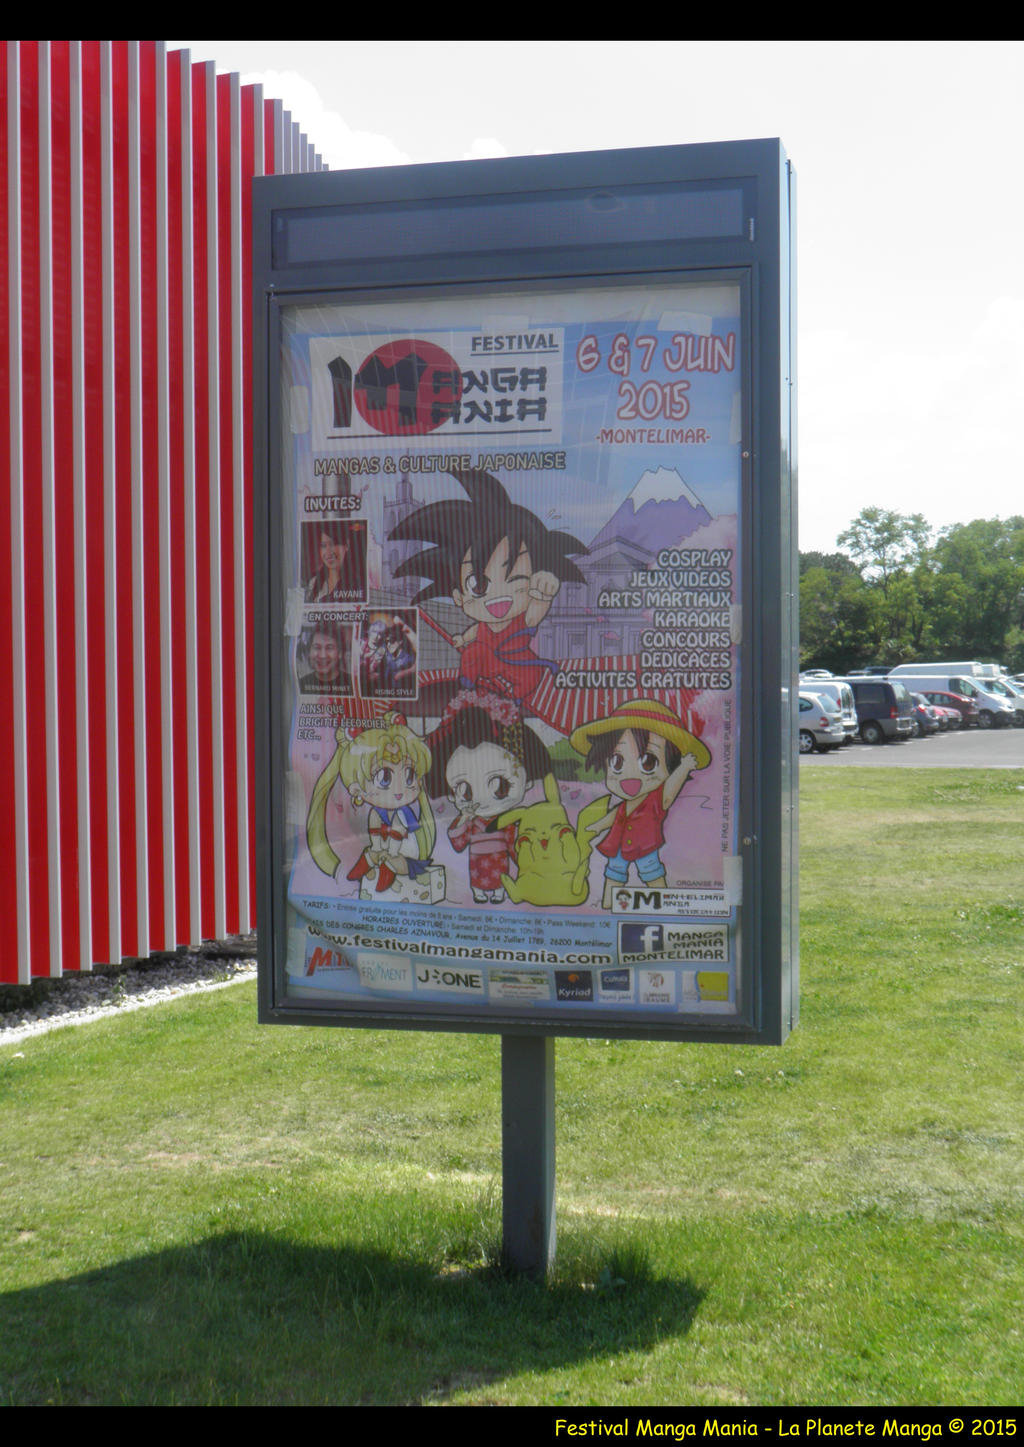 http://img05.deviantart.net/6685/i/2015/187/7/4/panneau___festival_manga_mania_by_japanmanianolife-d905flw.jpg